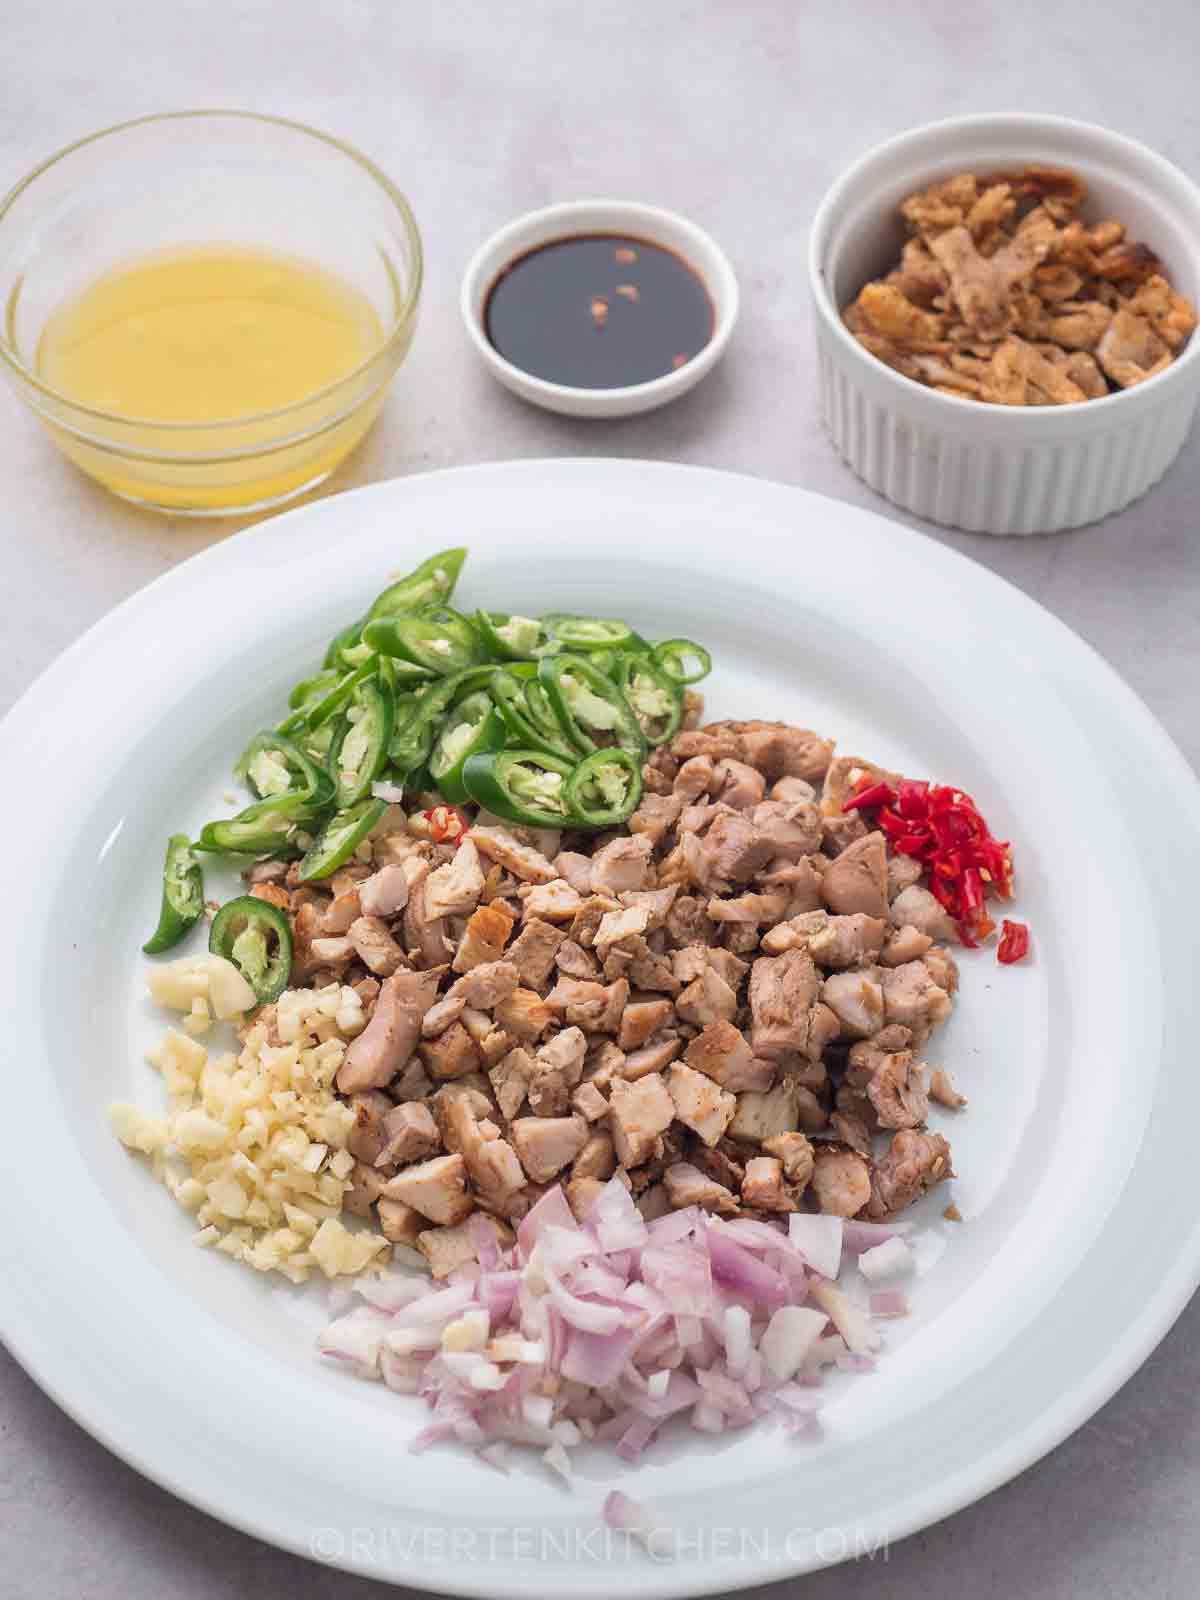 Chicken, garlic, onion, calamansi, green chili, liquid seasoning